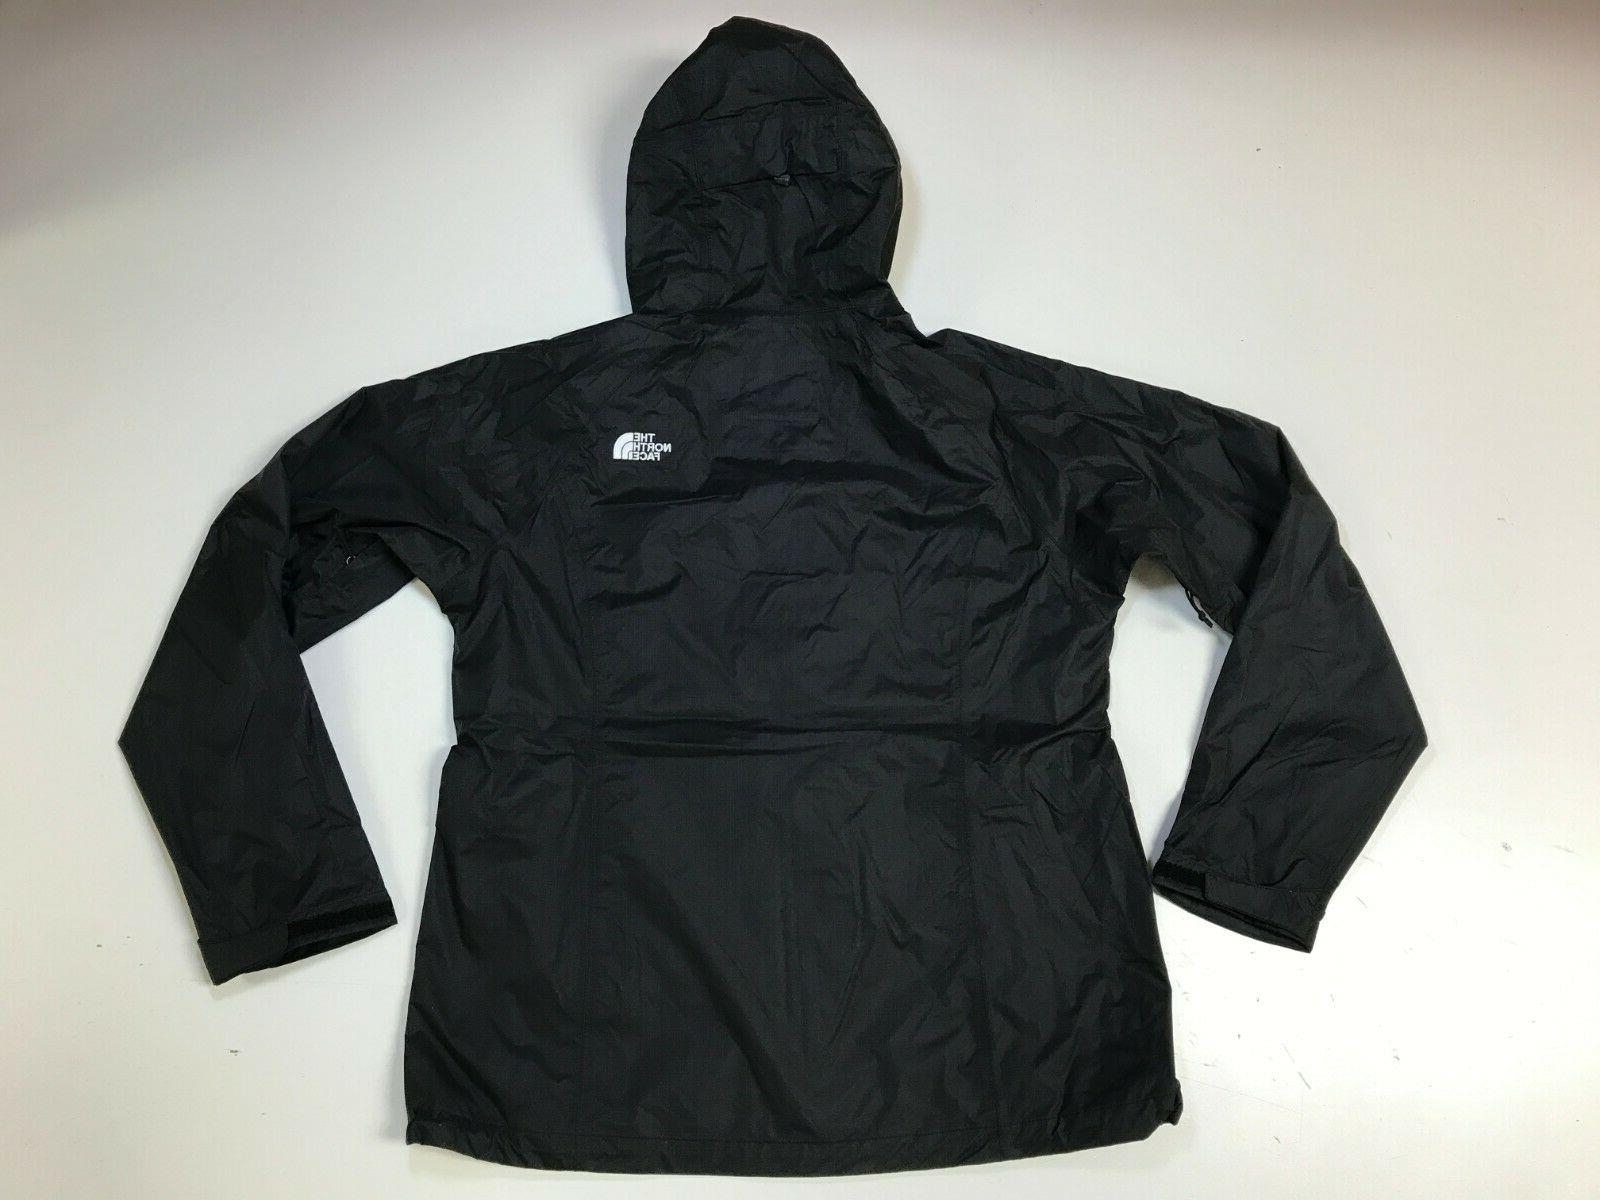 The North Venture DryVent Waterproof Jacket TNF $99